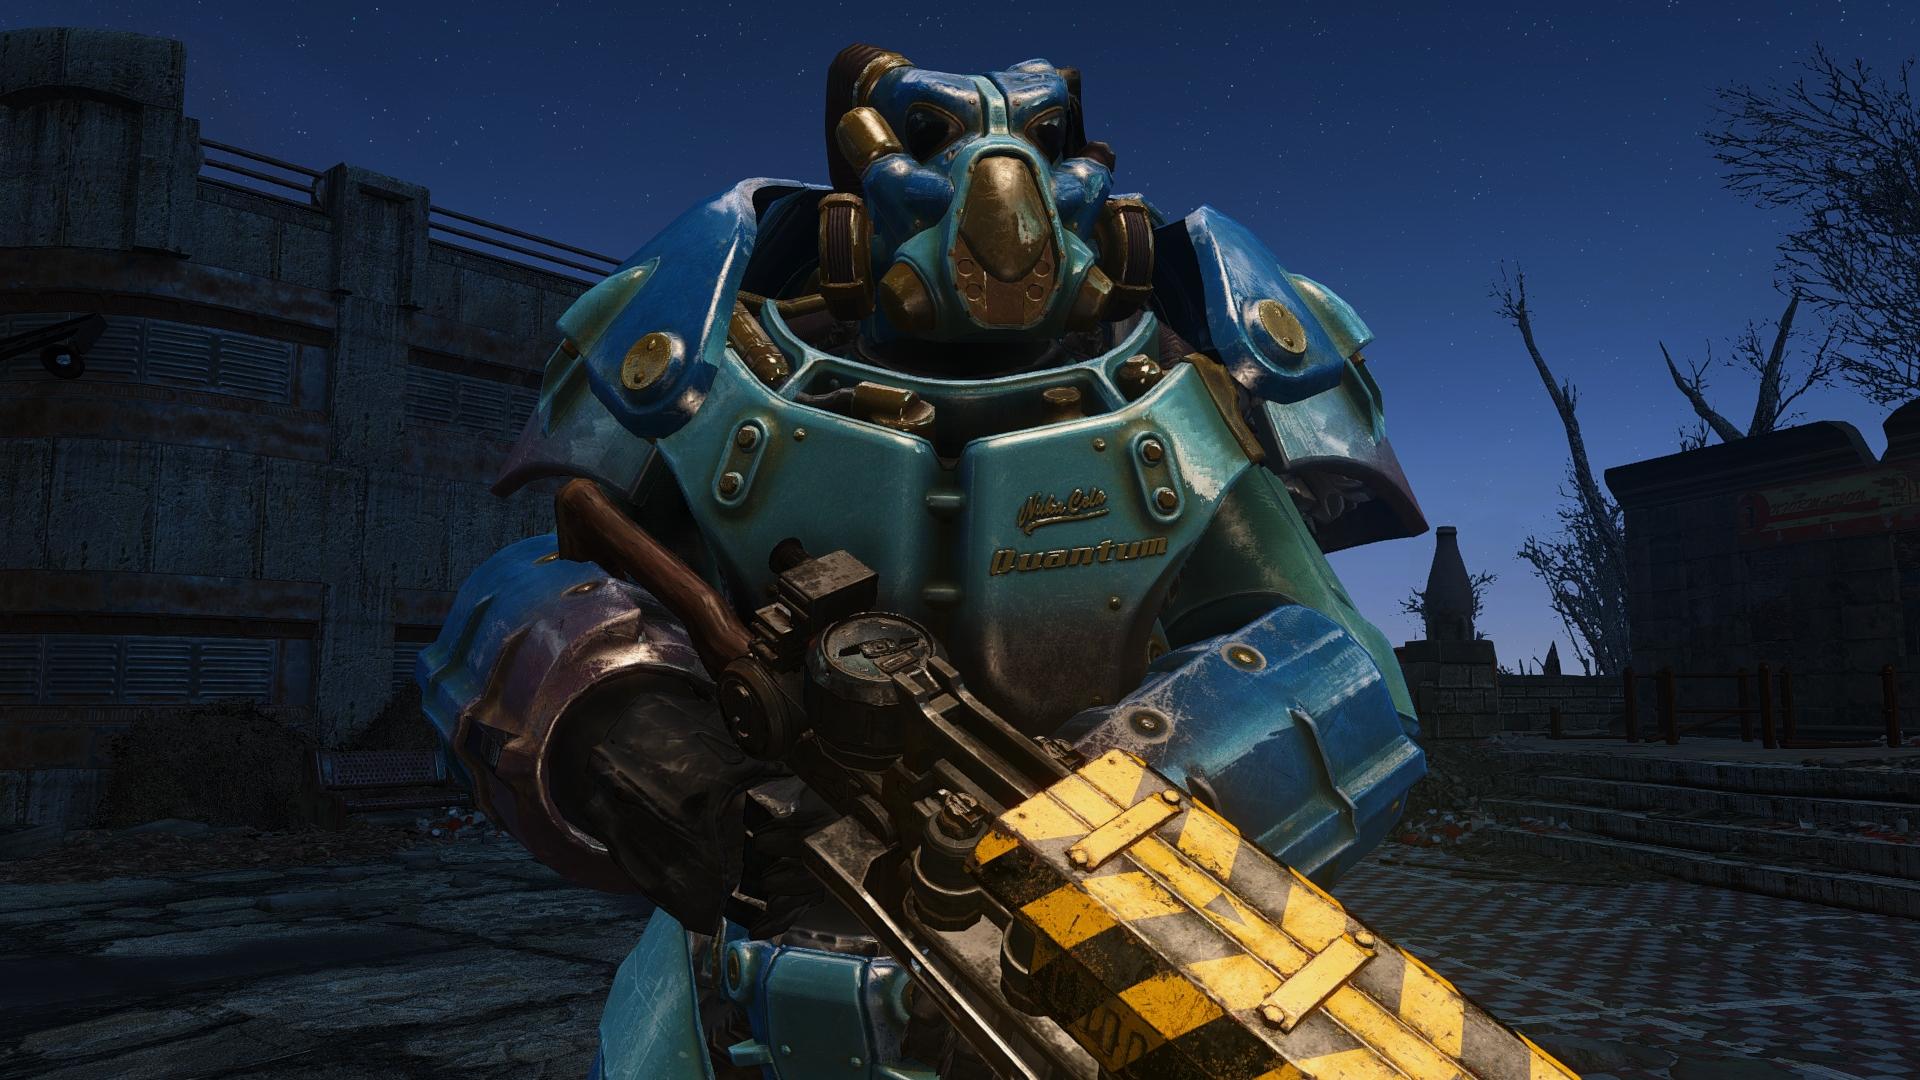 00012.Jpg - Fallout 4